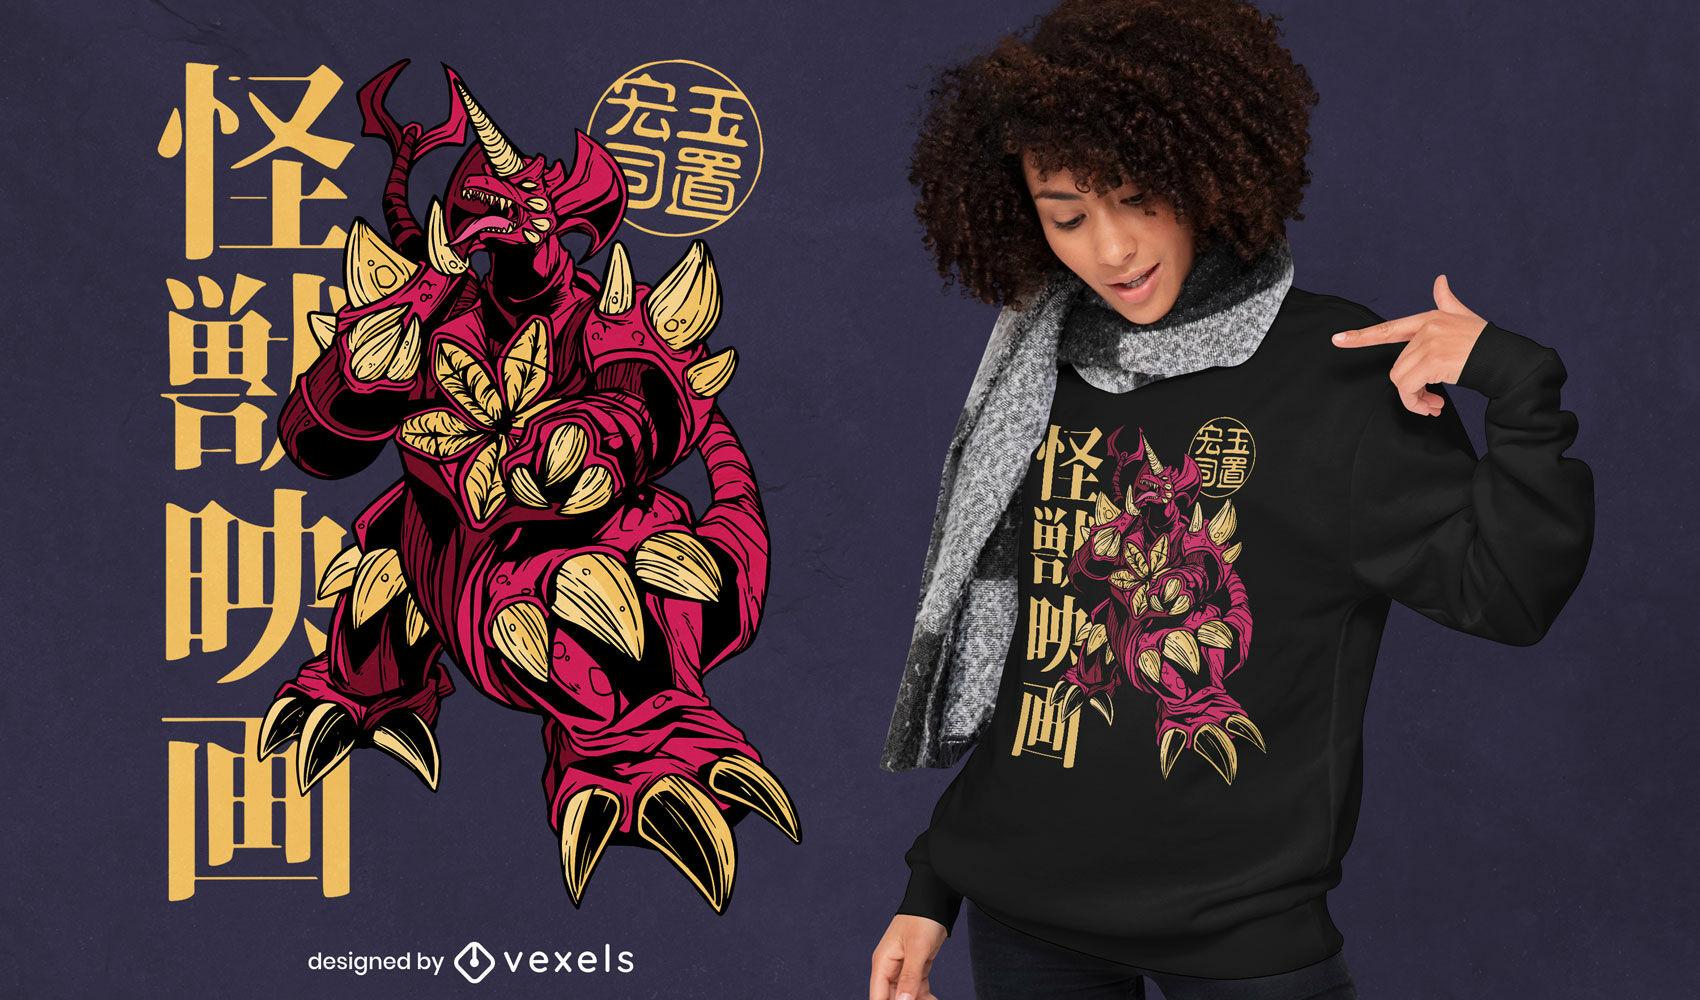 Dise?o de camiseta japonesa demonio kaiju monster